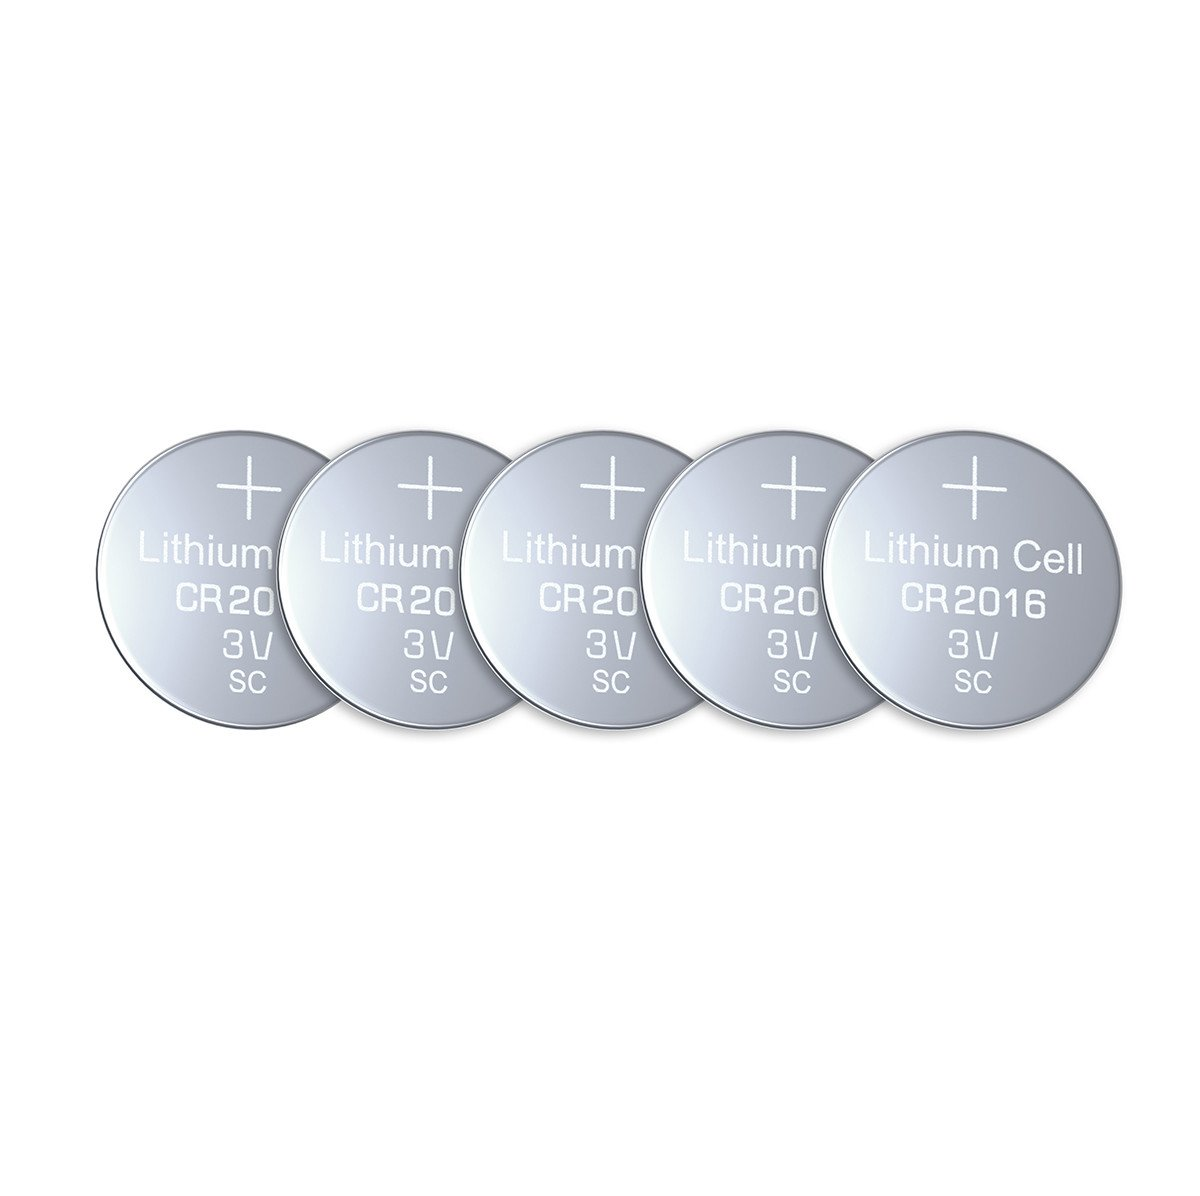 EBL CR2016 Tipo de 2016 / DL2016 / ECR2016 3V Litio Moneda Botón Celula de la Bateria para Reloj, Juguetes Electrónicos (5 Unidades)